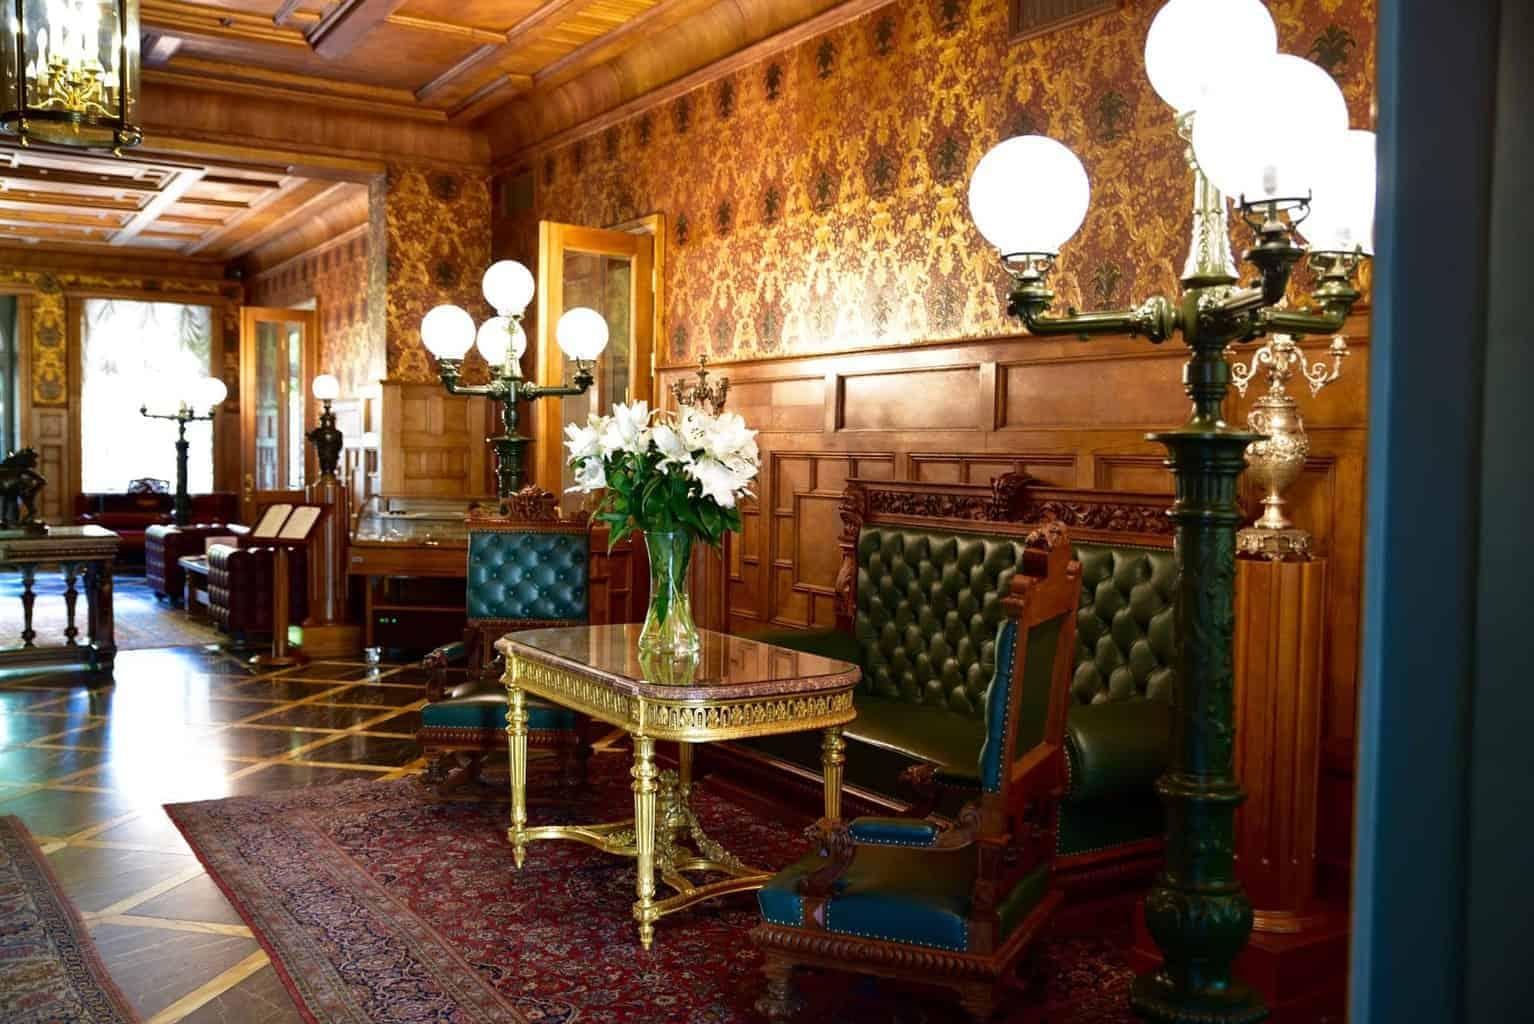 Gallery Park Hotel, Riga Latvia